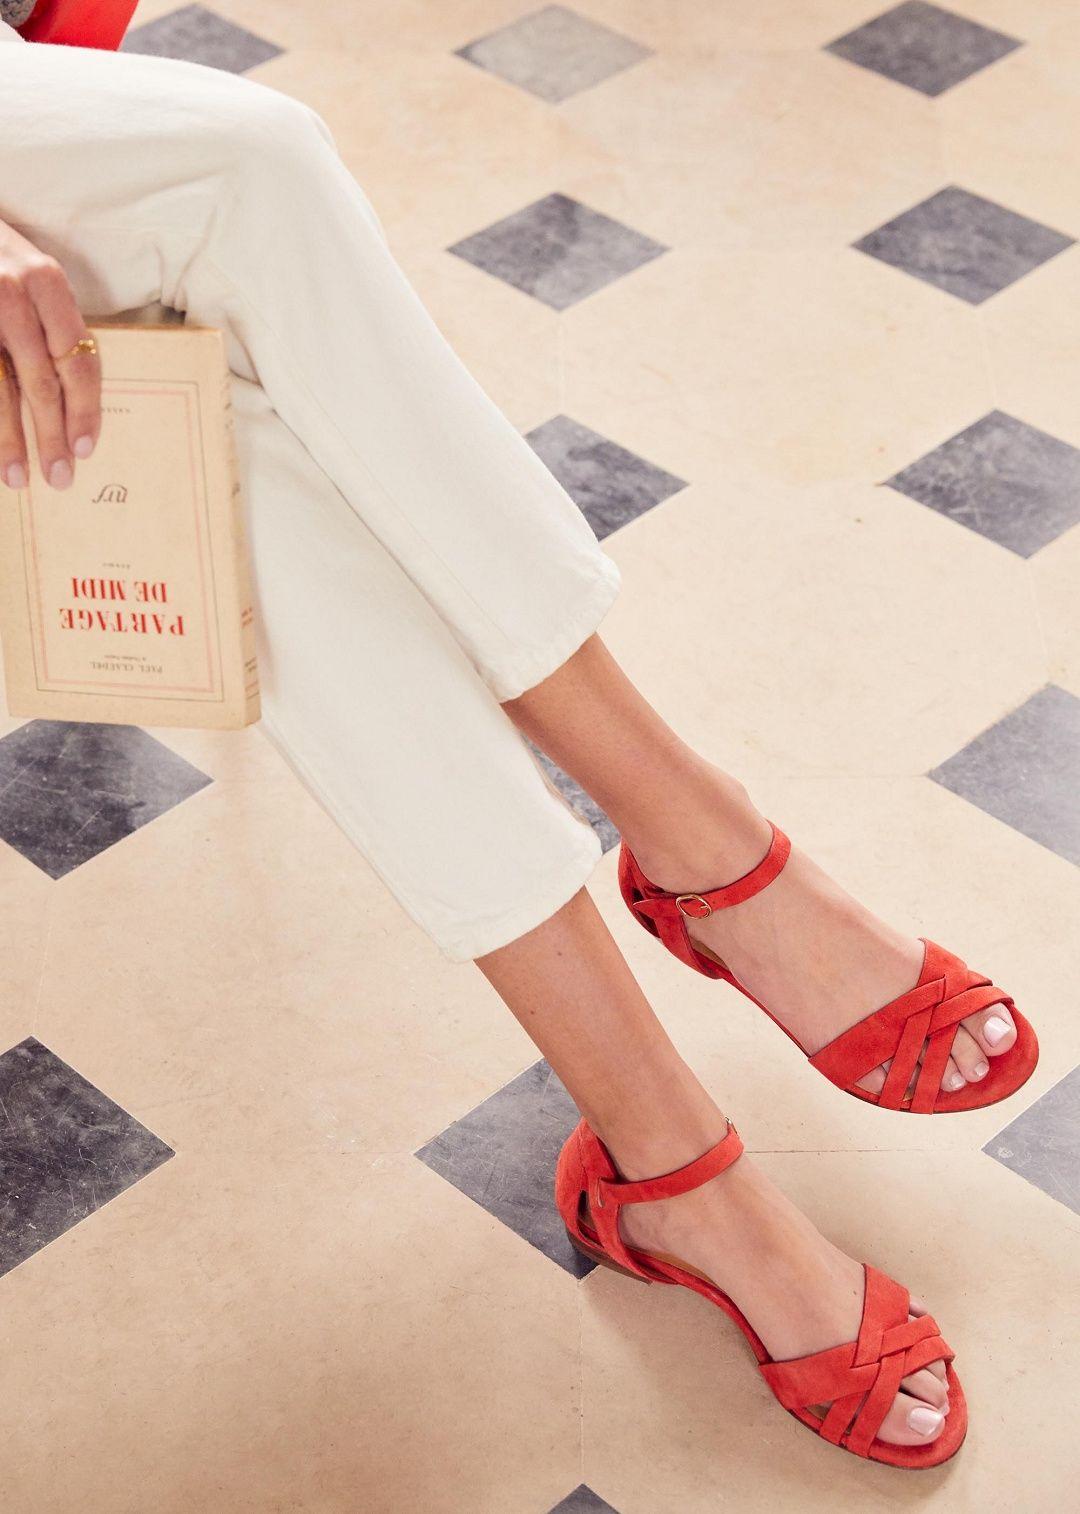 767eadbdc5d Sézane - Low Elise sandals $200 | Fashion for Feet Summer 2018 ...